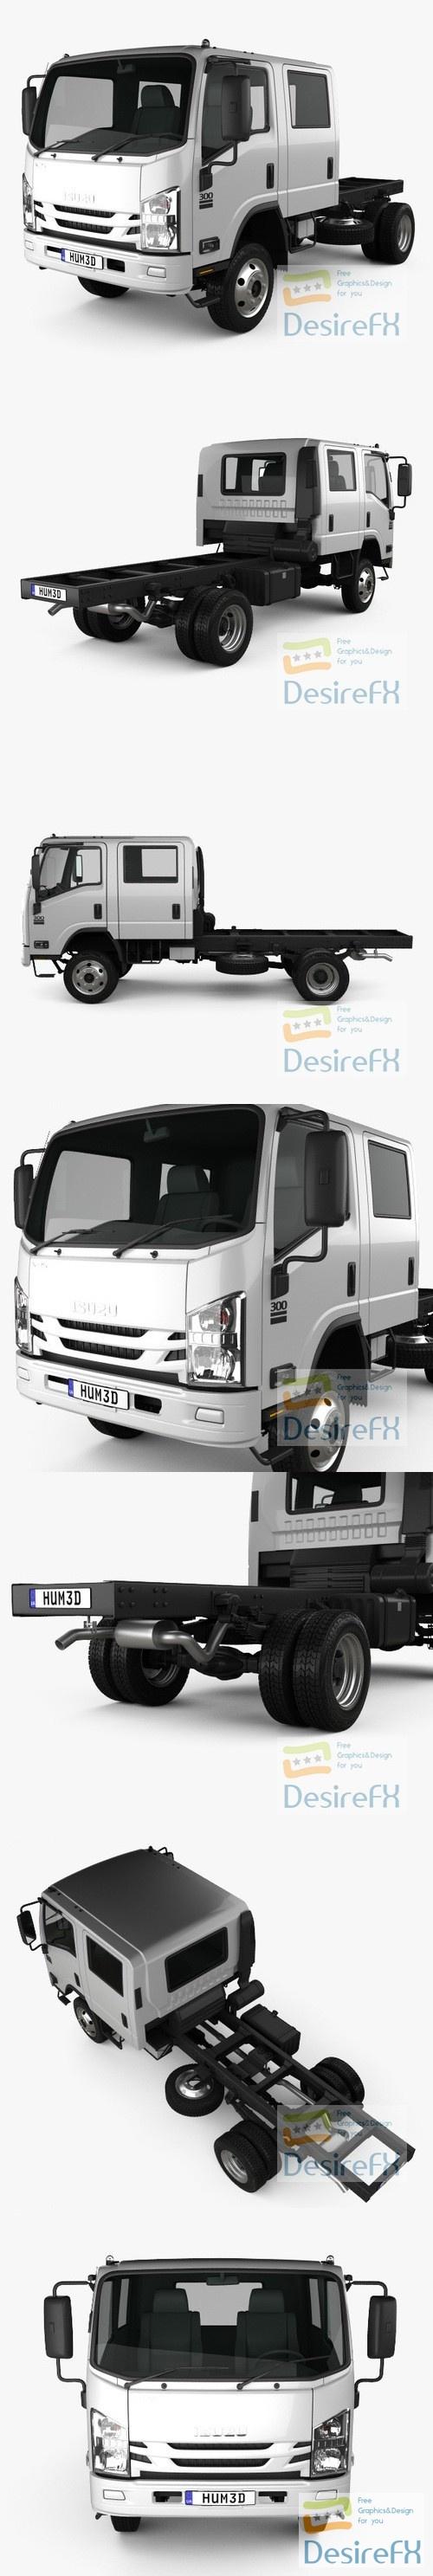 Isuzu NPS 300 Crew Cab Chassis Truck 2015 3D Model